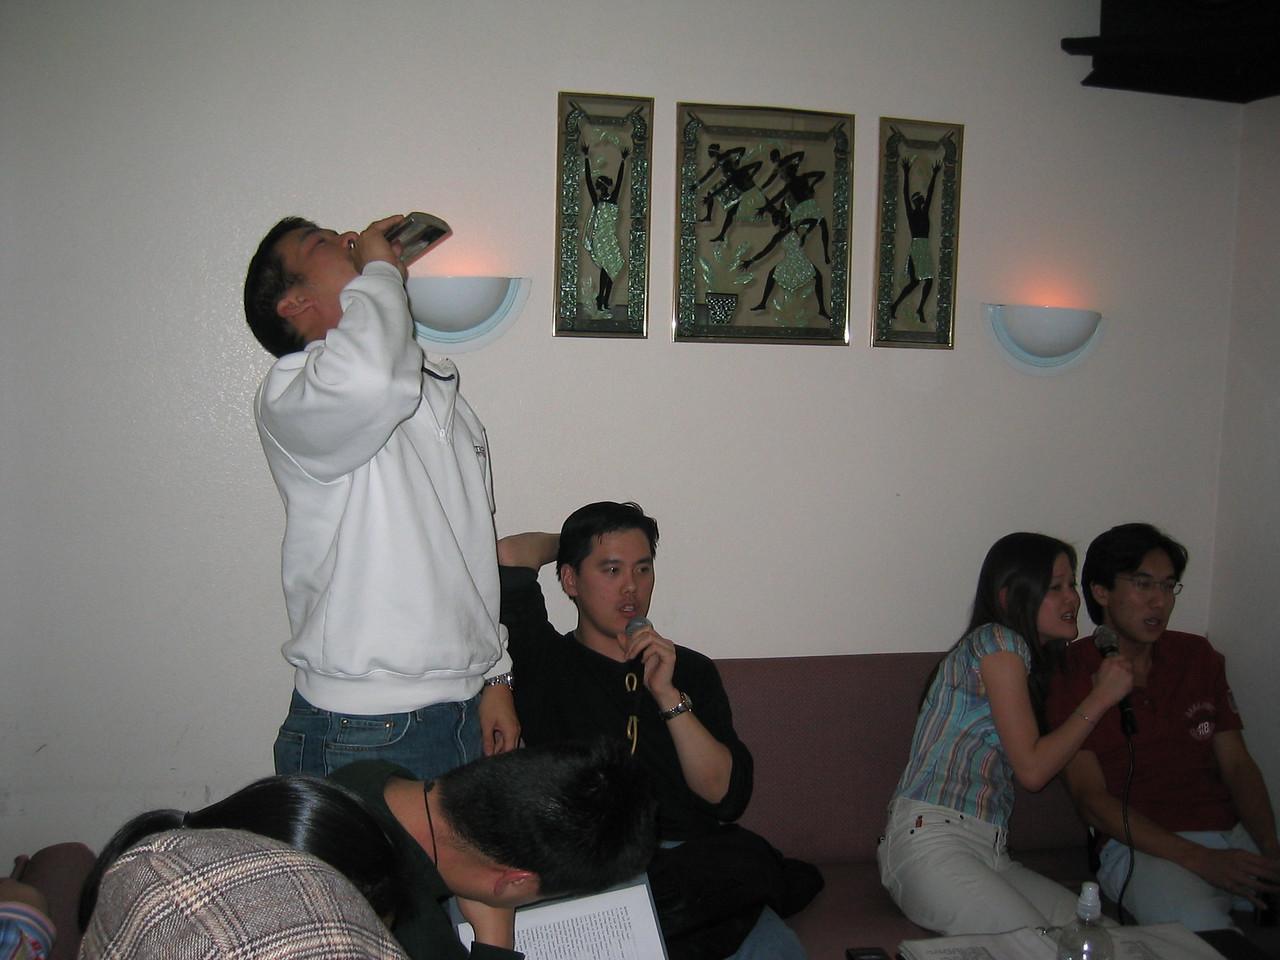 2004 12 18 Saturday - Alex Wang bottoms up @ karaoke